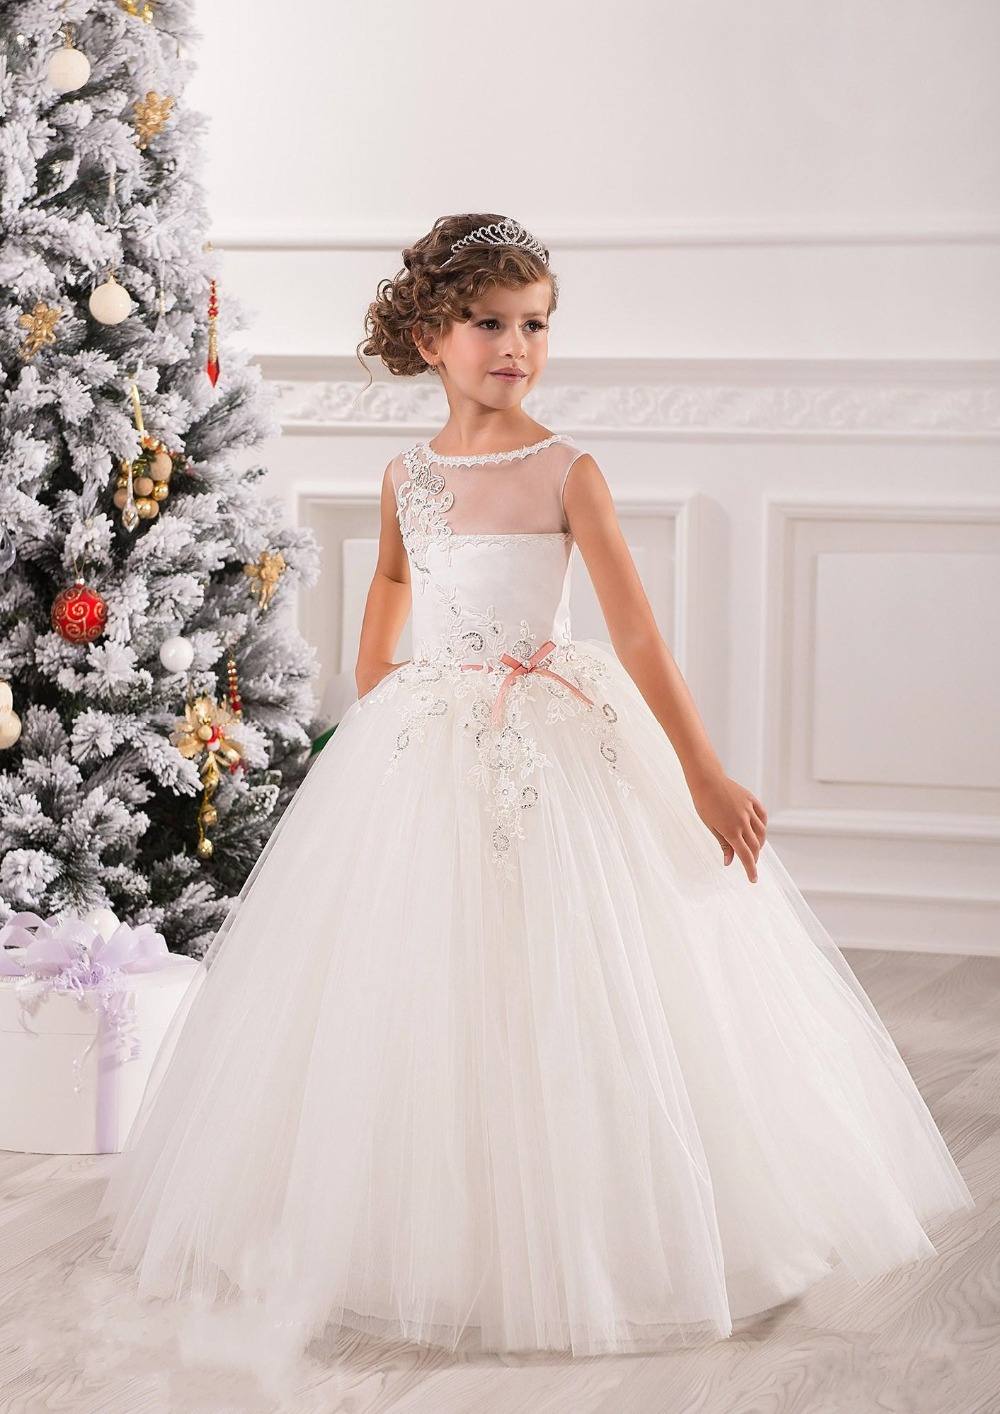 Beautiful Flower Girl Dresses